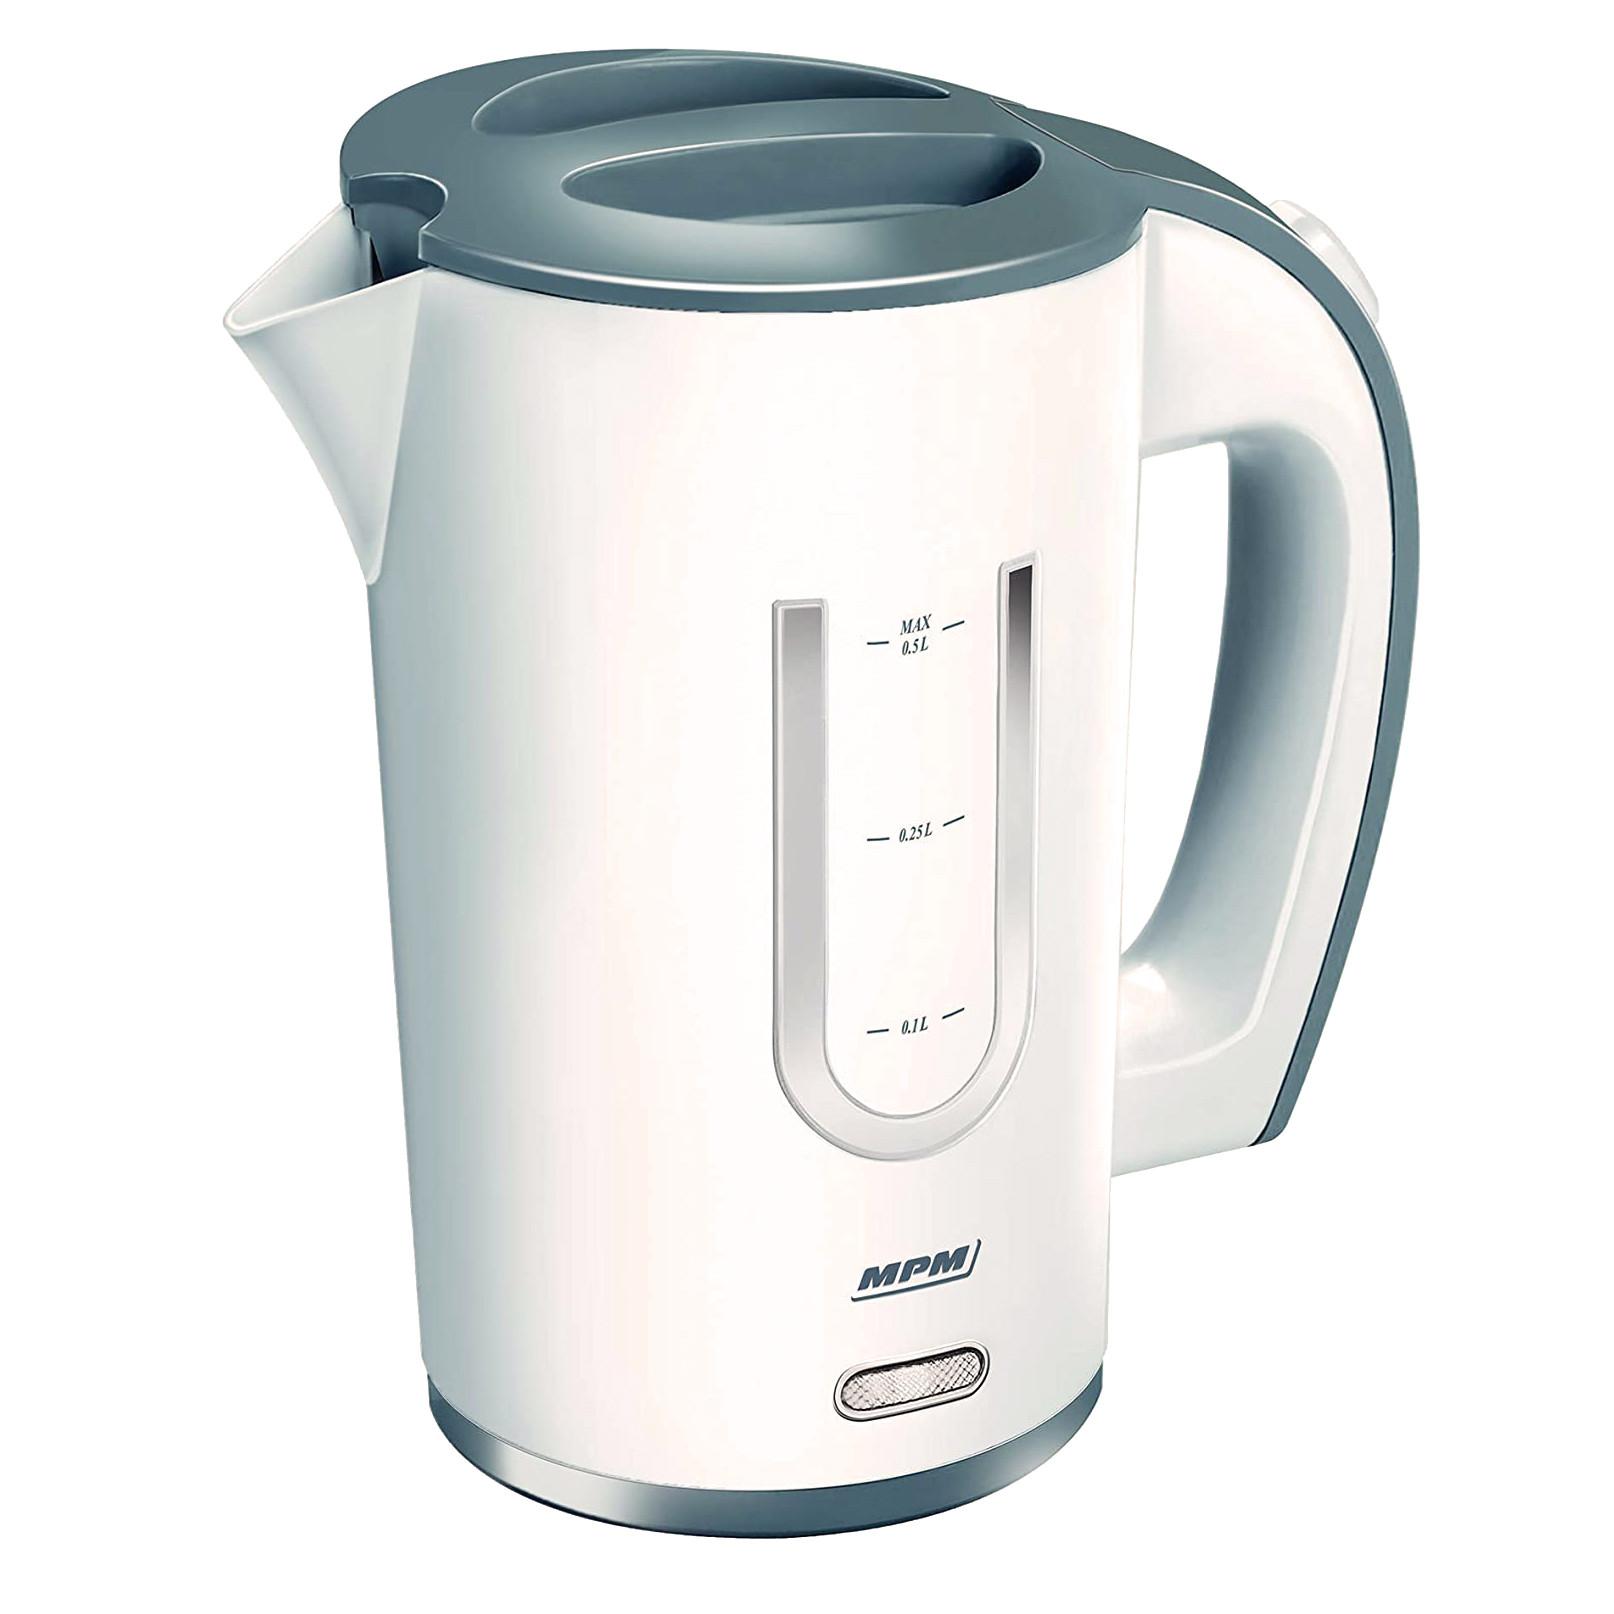 MPM MCZ-54 Hervidor de Agua Eléctrico compacto, 0,5 Litros, 1000W, Ventana Lateral, Libre de BPA